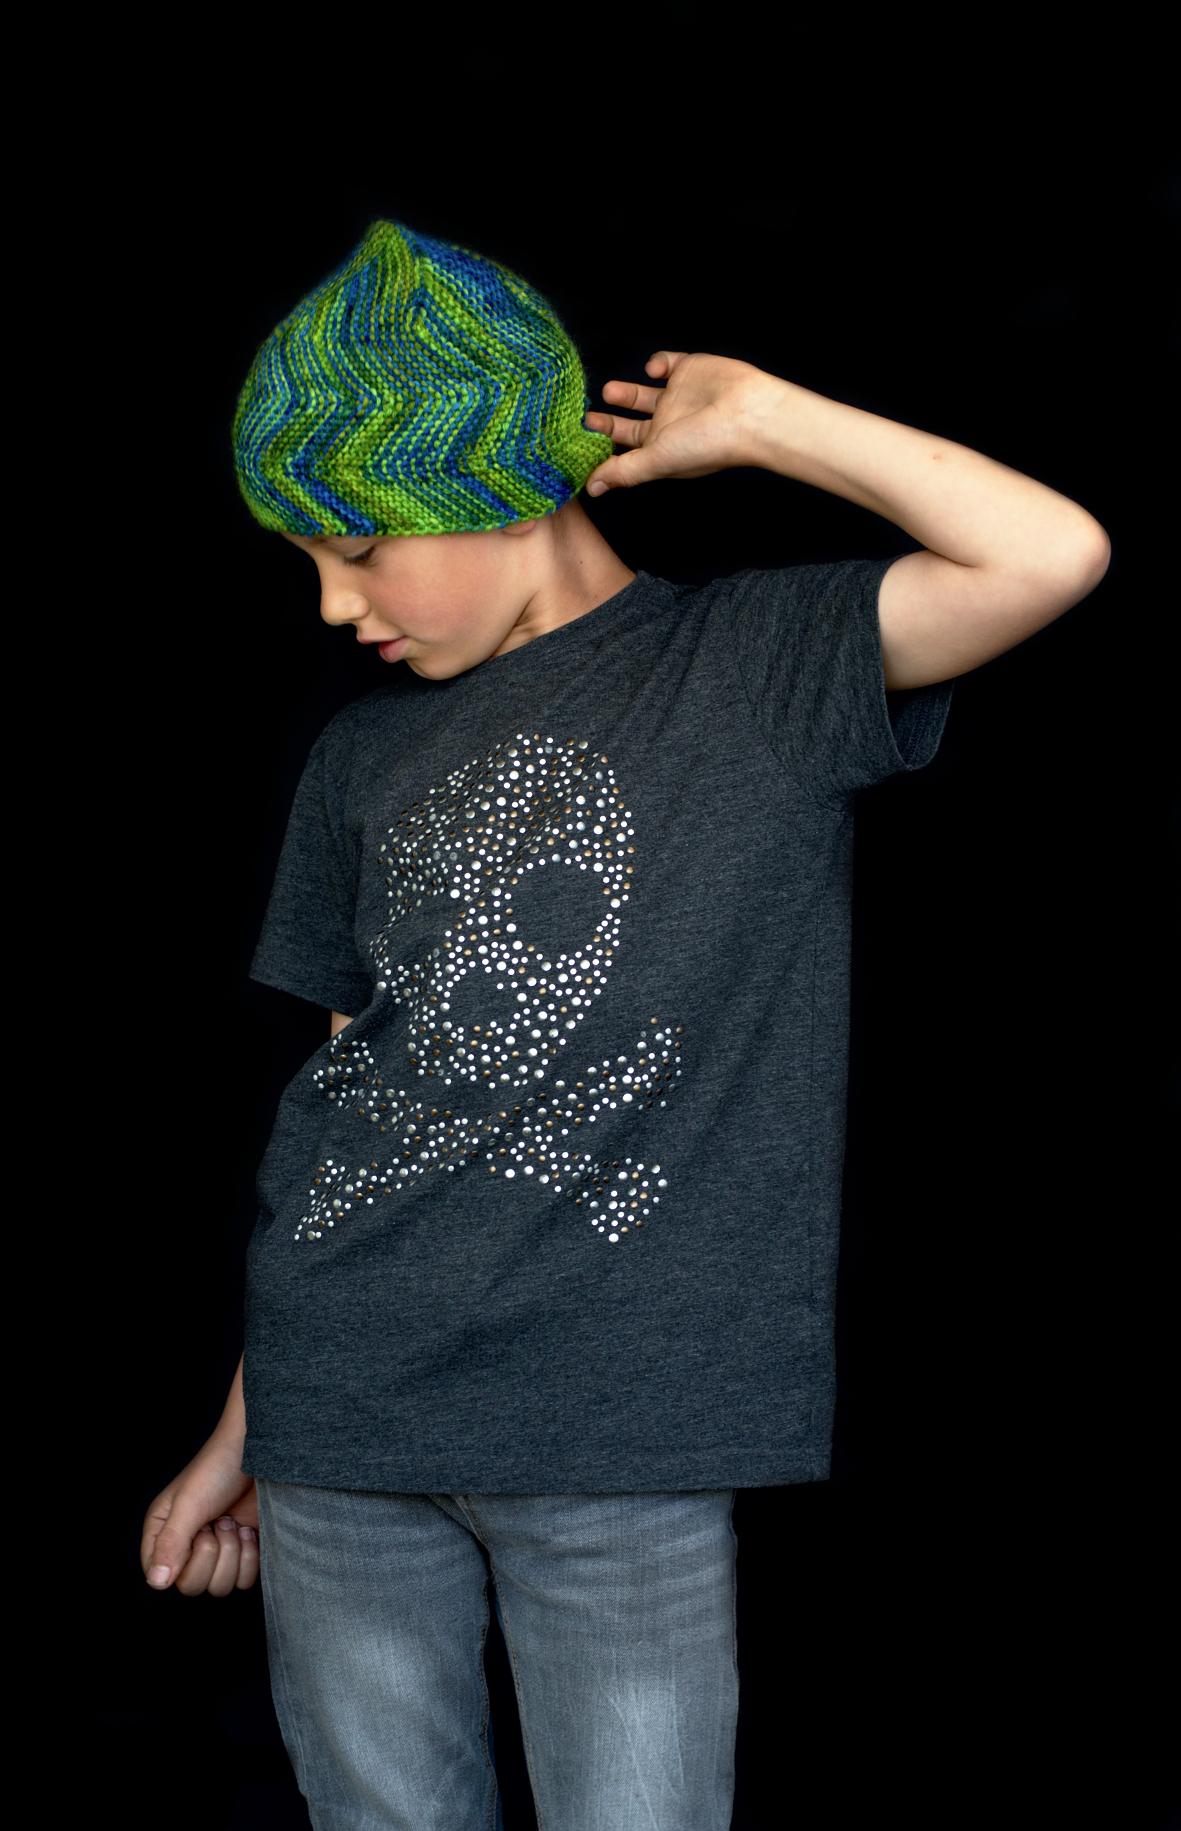 Mobberley hand knitting pattern for sideways knit pixie beanie